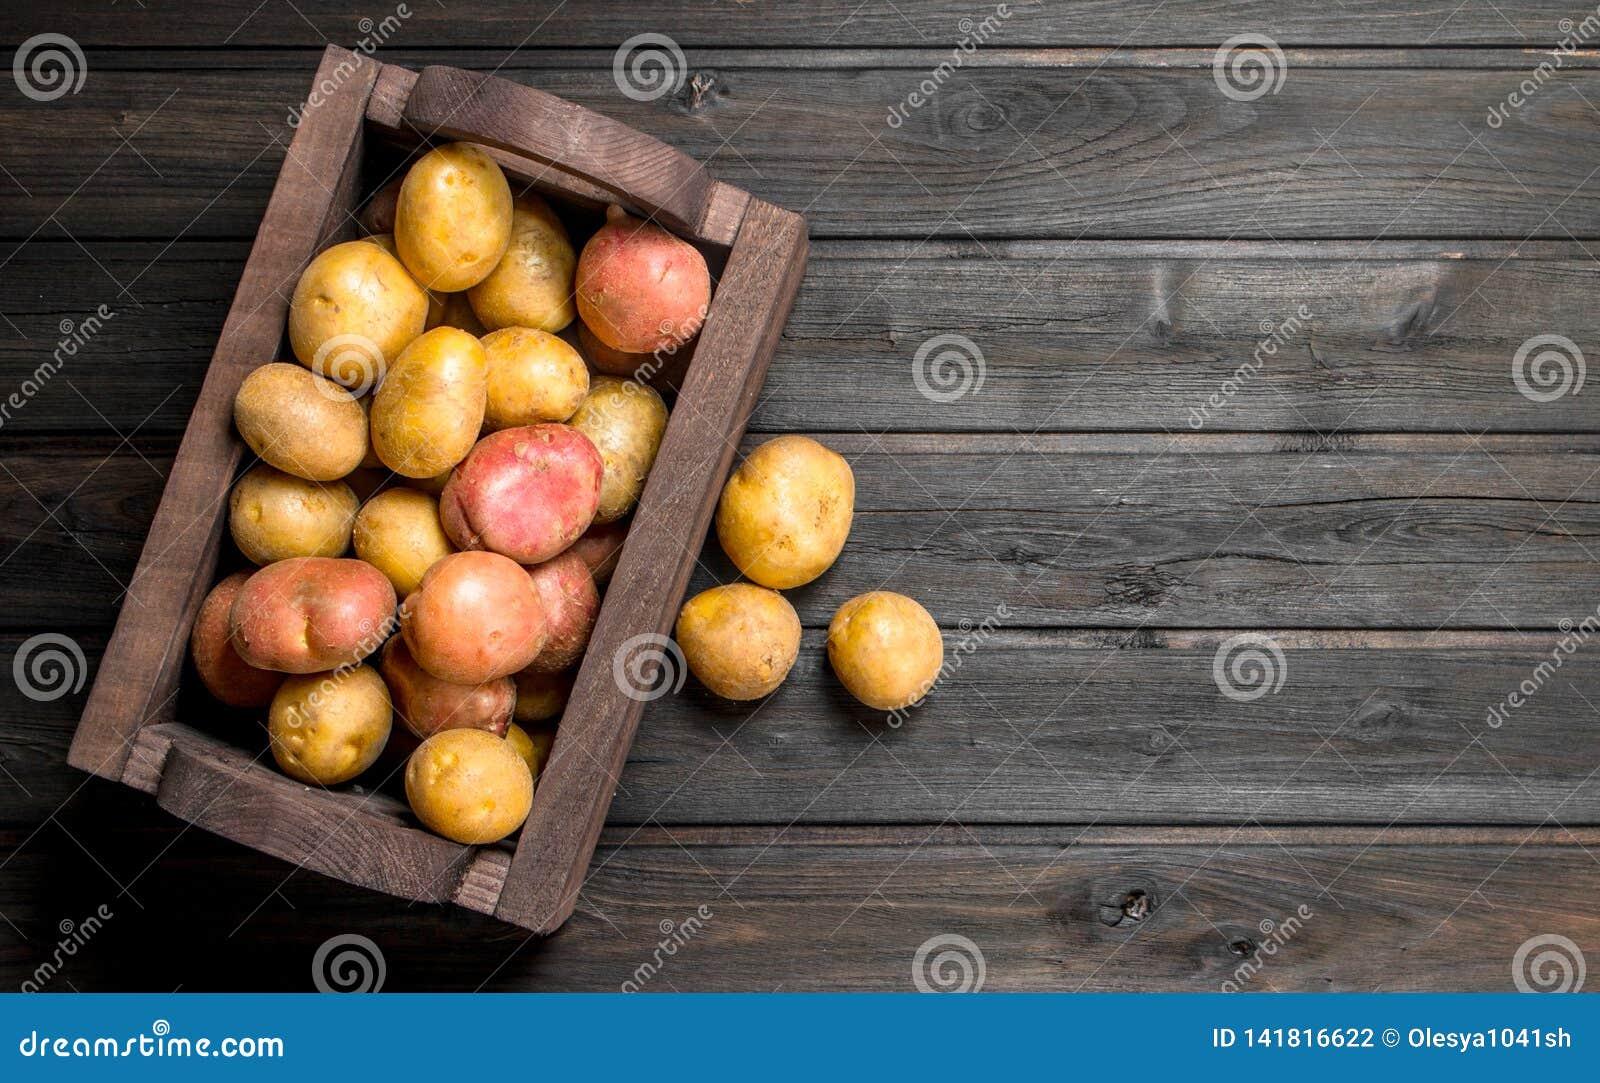 Fresh potatoes in a wooden box